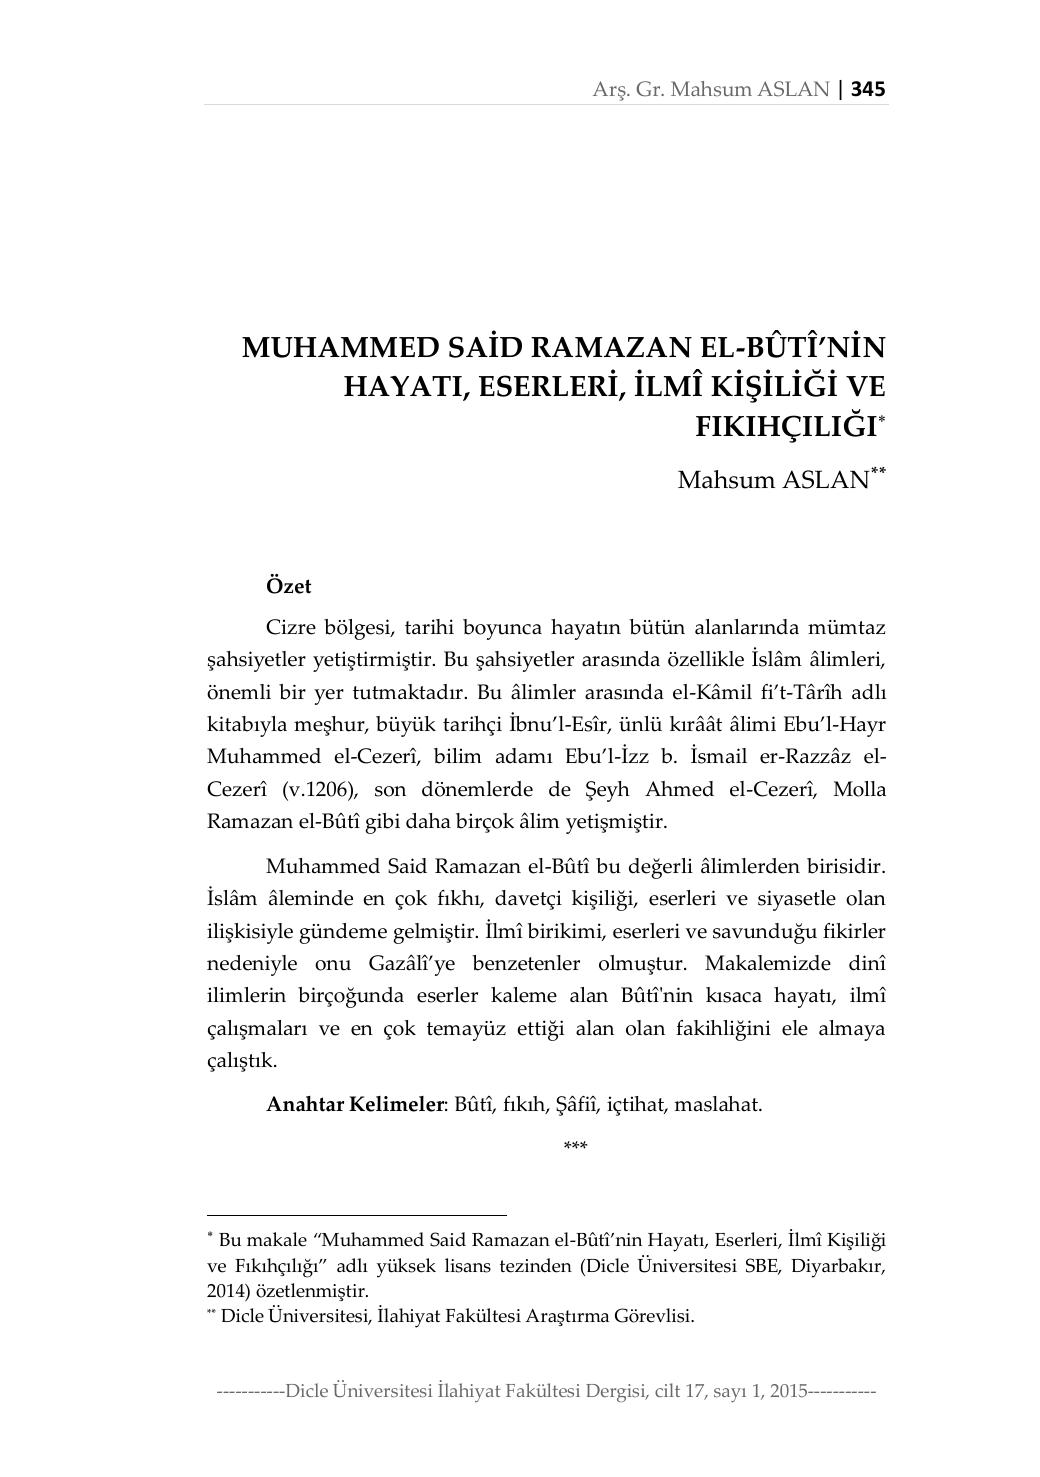 muhammed said ramazan el buti nin